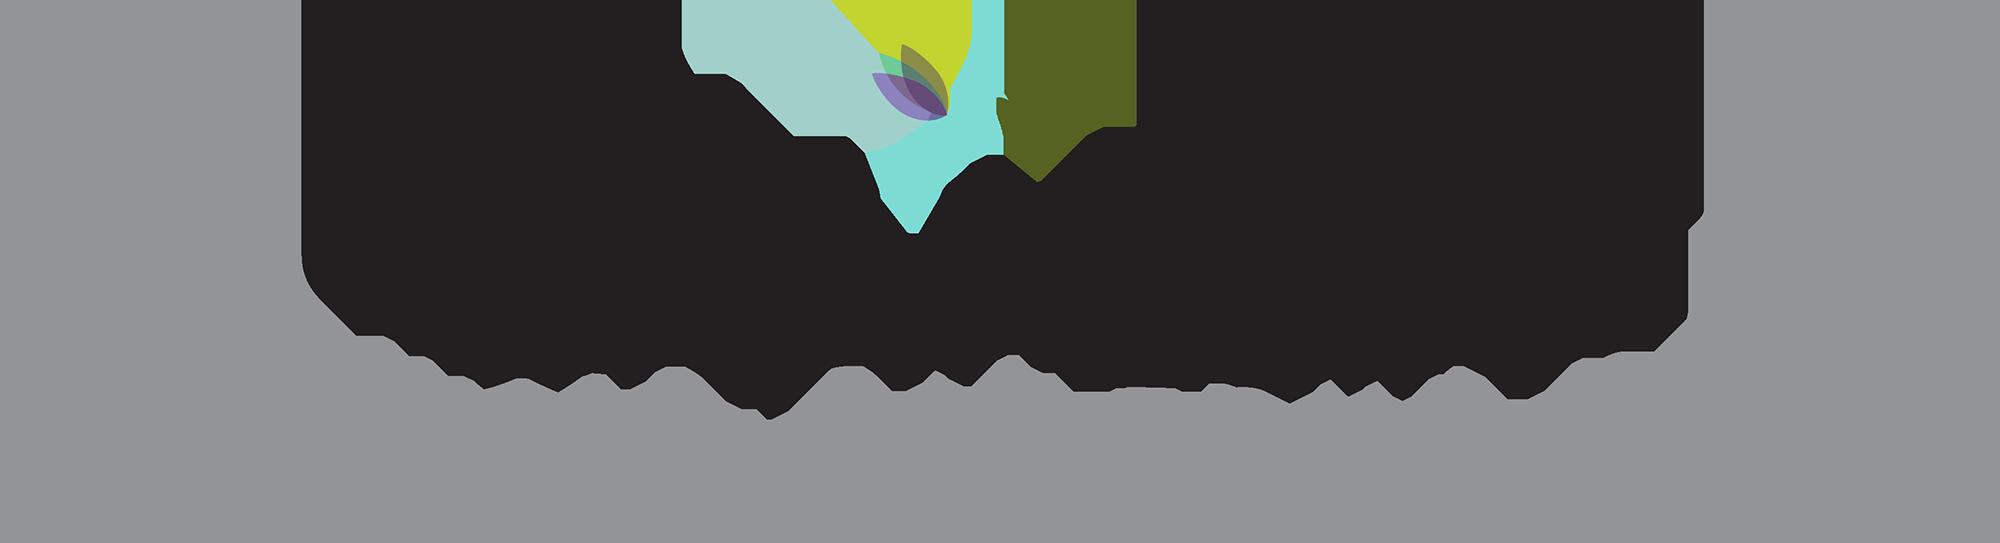 Chamilia_Logo_4505C.png